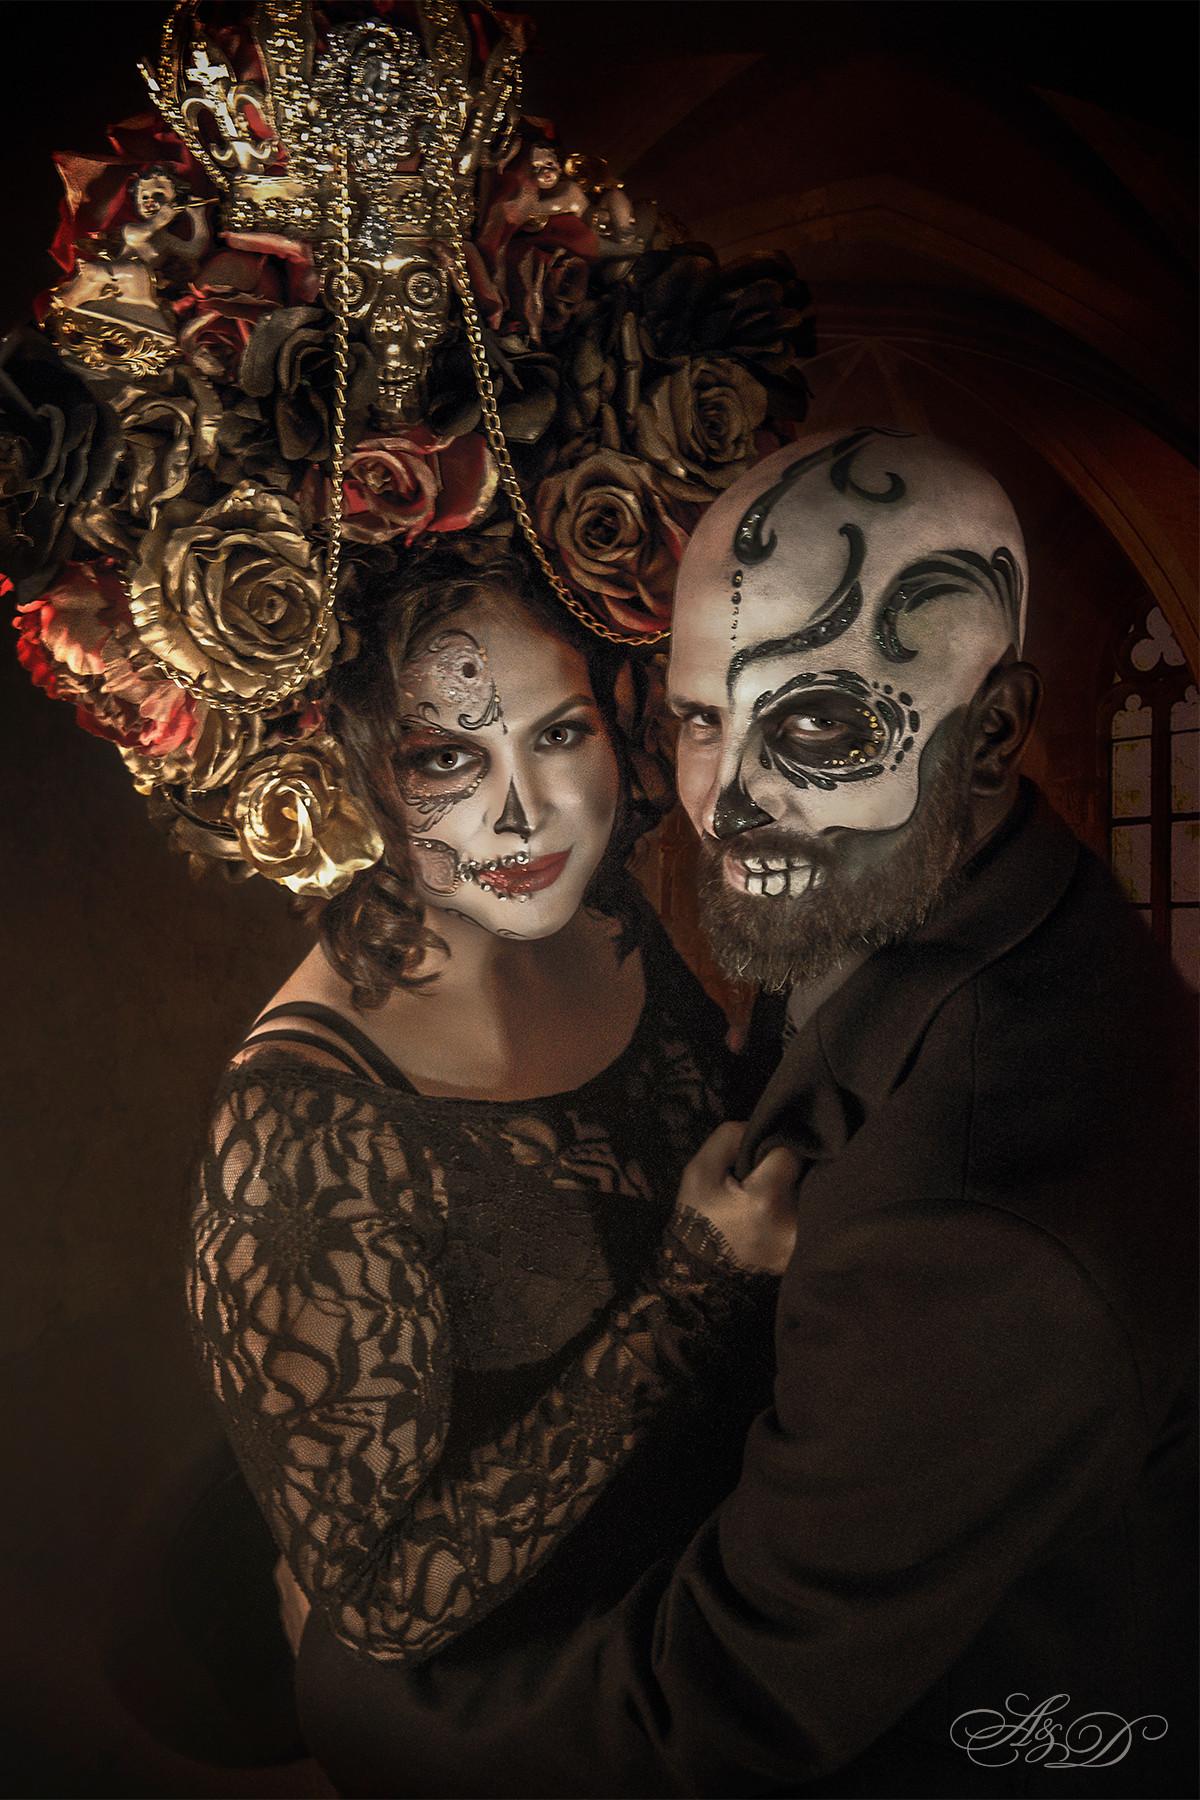 Couples Fantasy Art